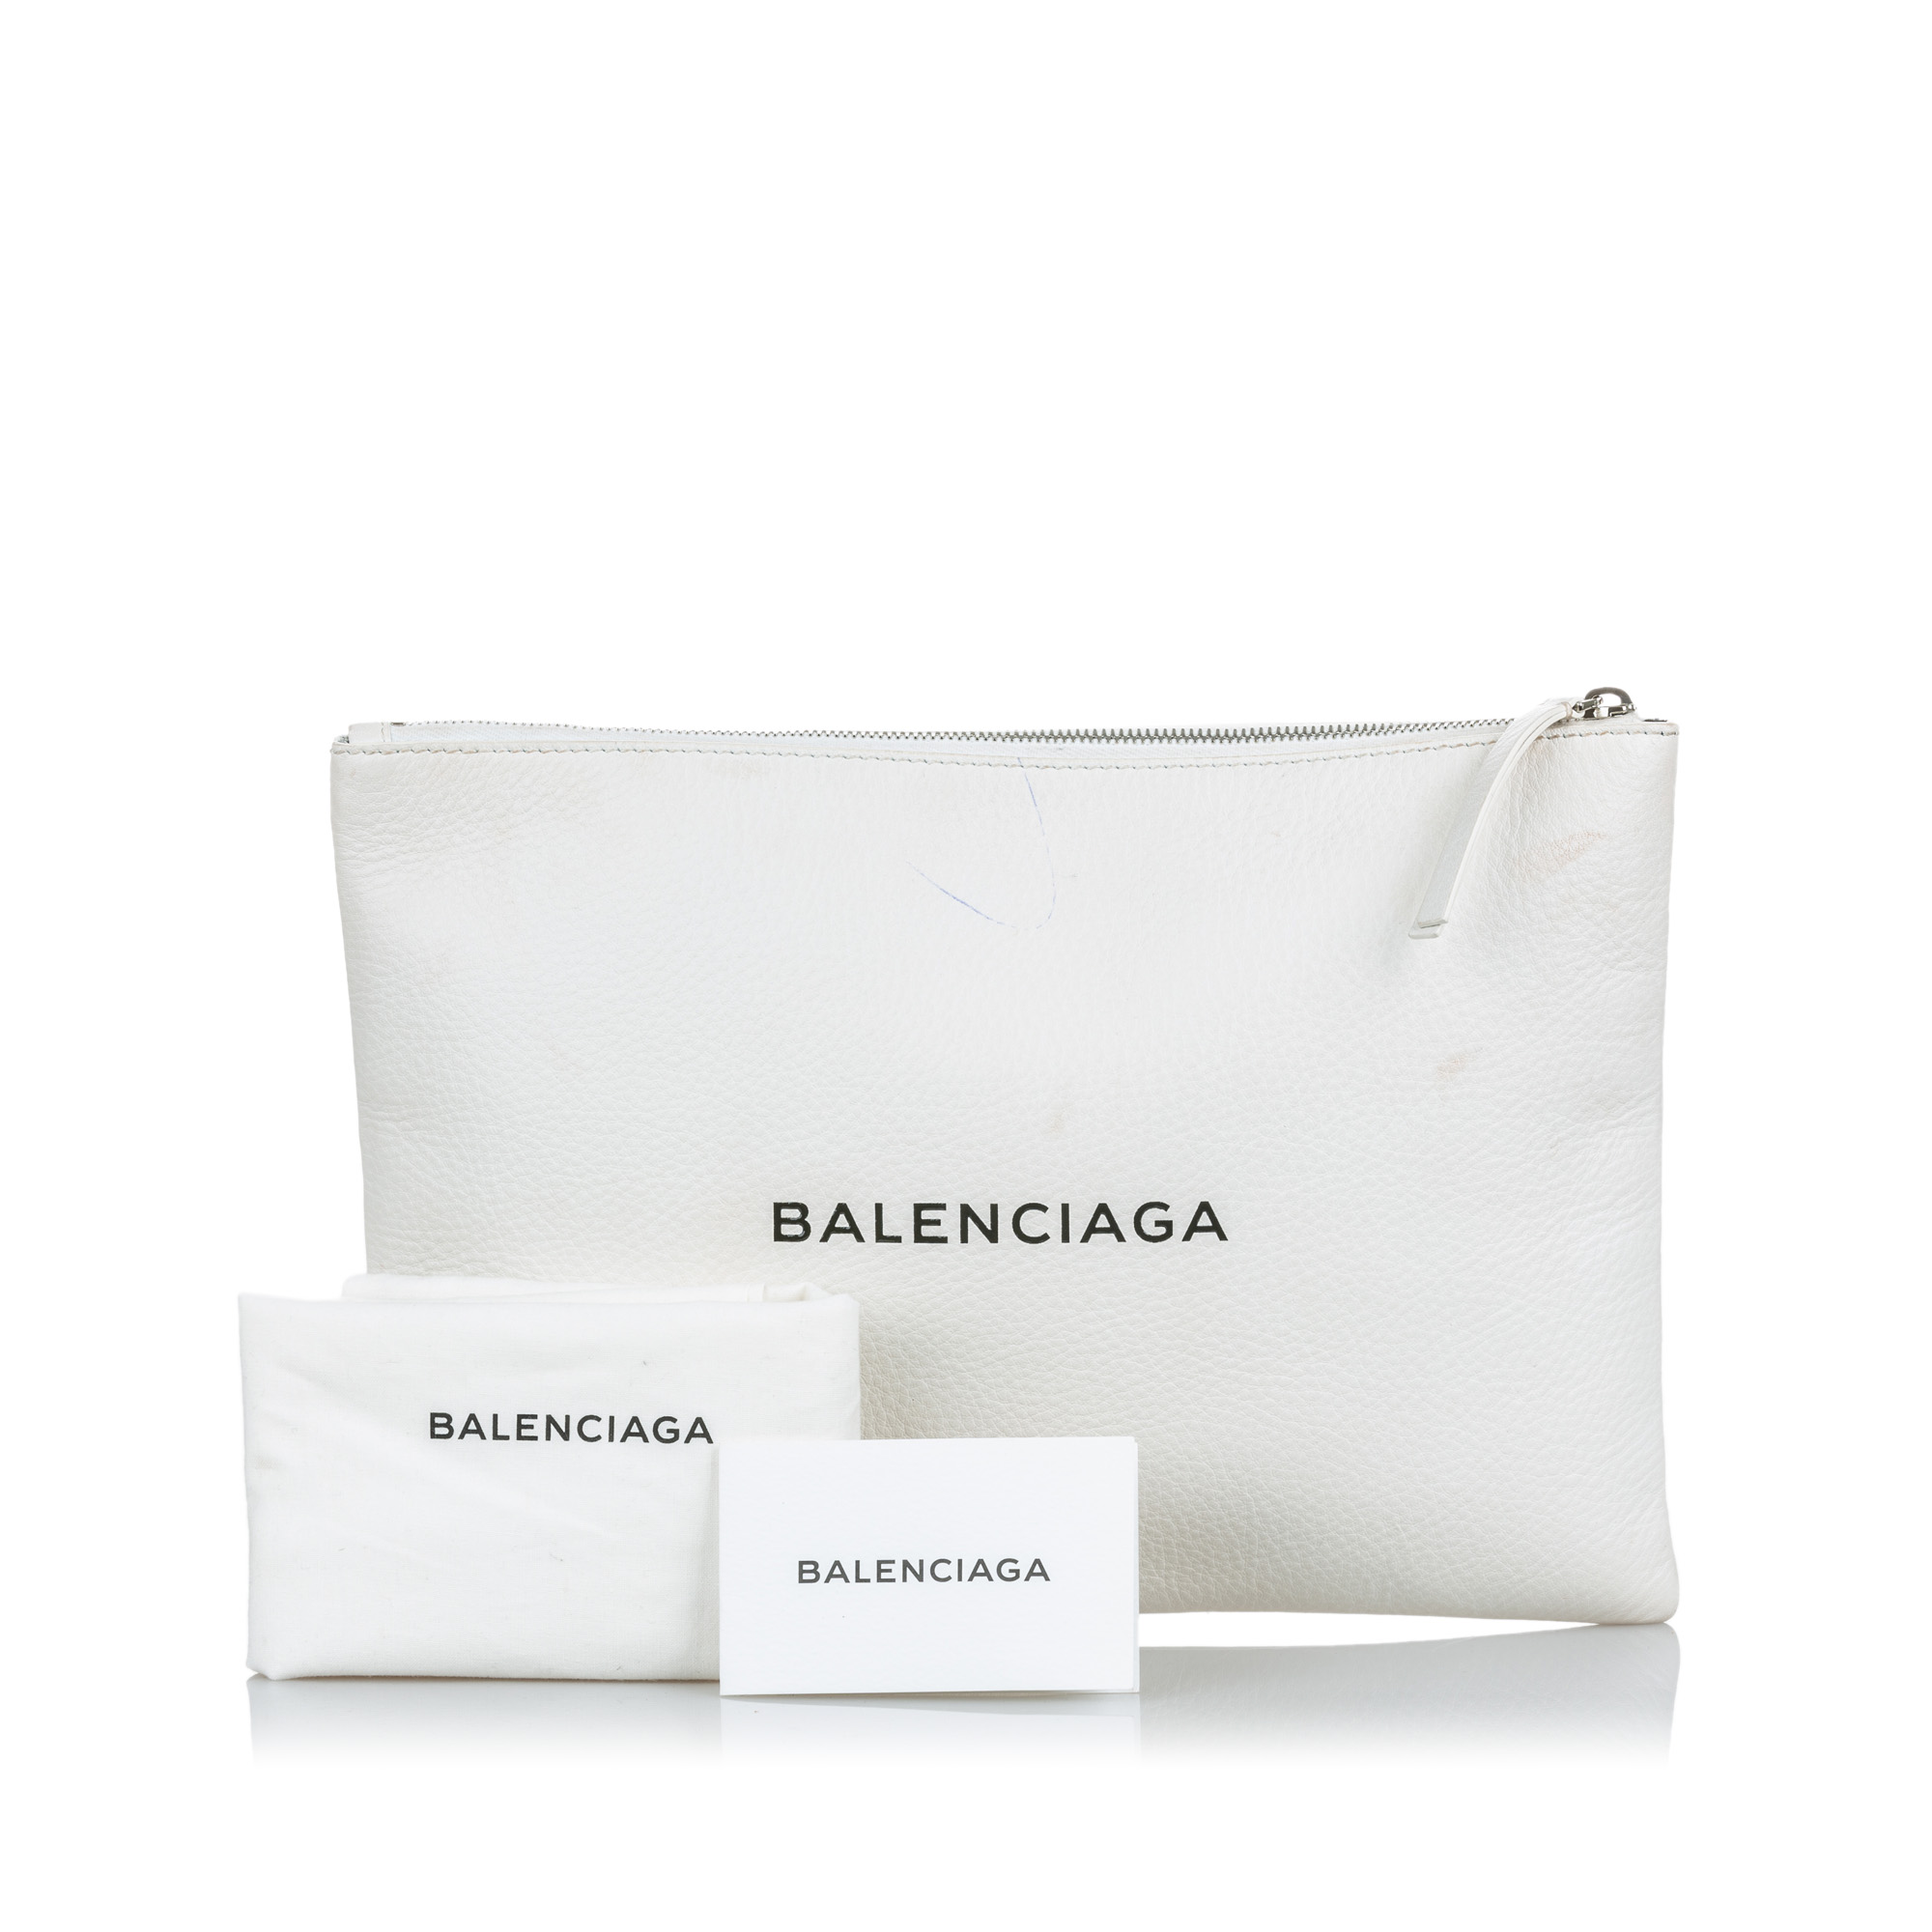 Balenciaga White Leather Everyday Clutch Bag